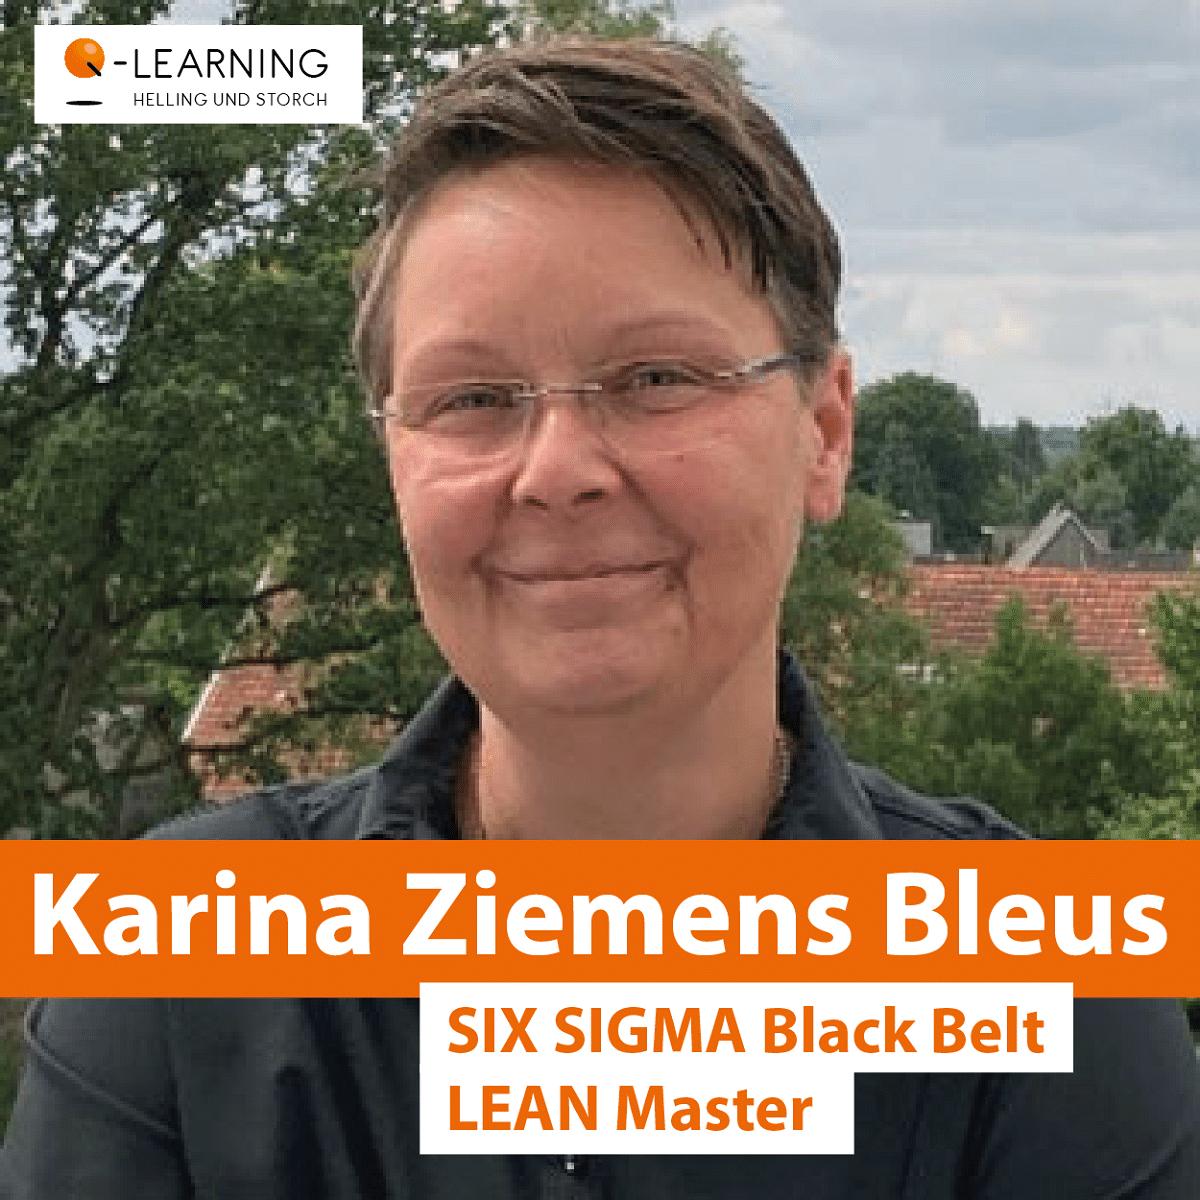 Portrait Karina Ziemens Bleus - SIX SIGMA Black Belt, LEAN Master